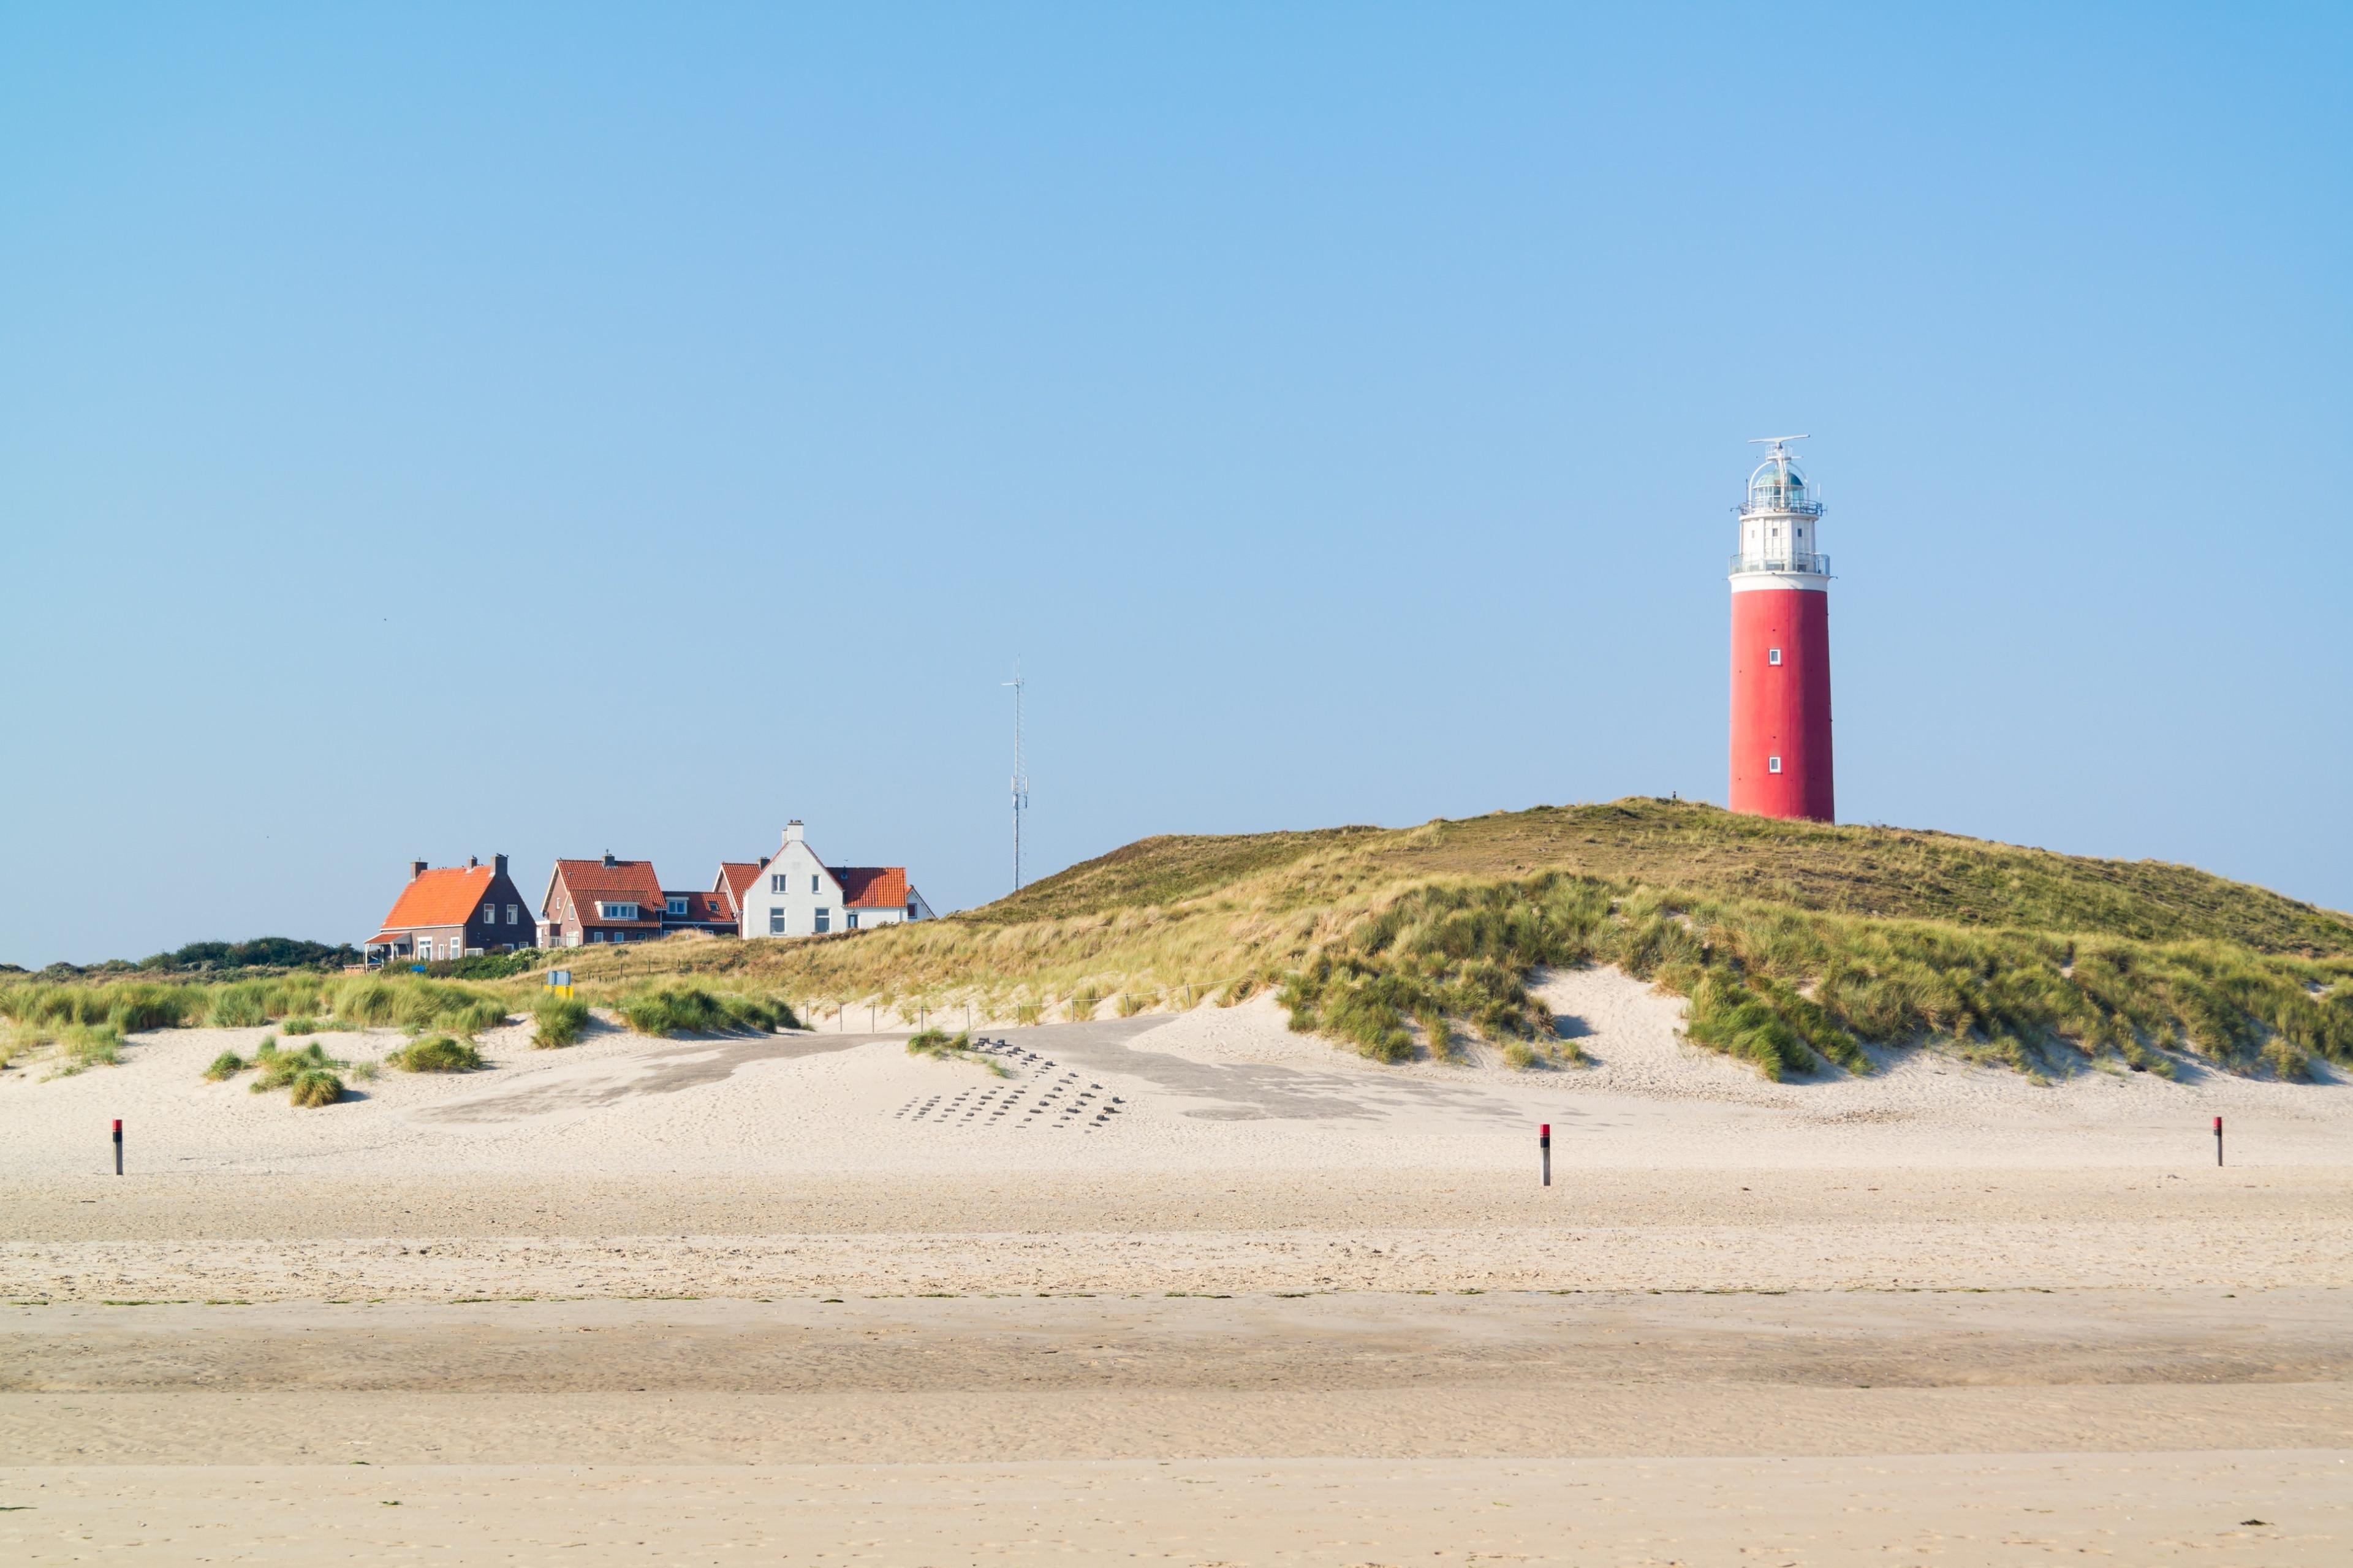 Texel Island, North Holland, Netherlands